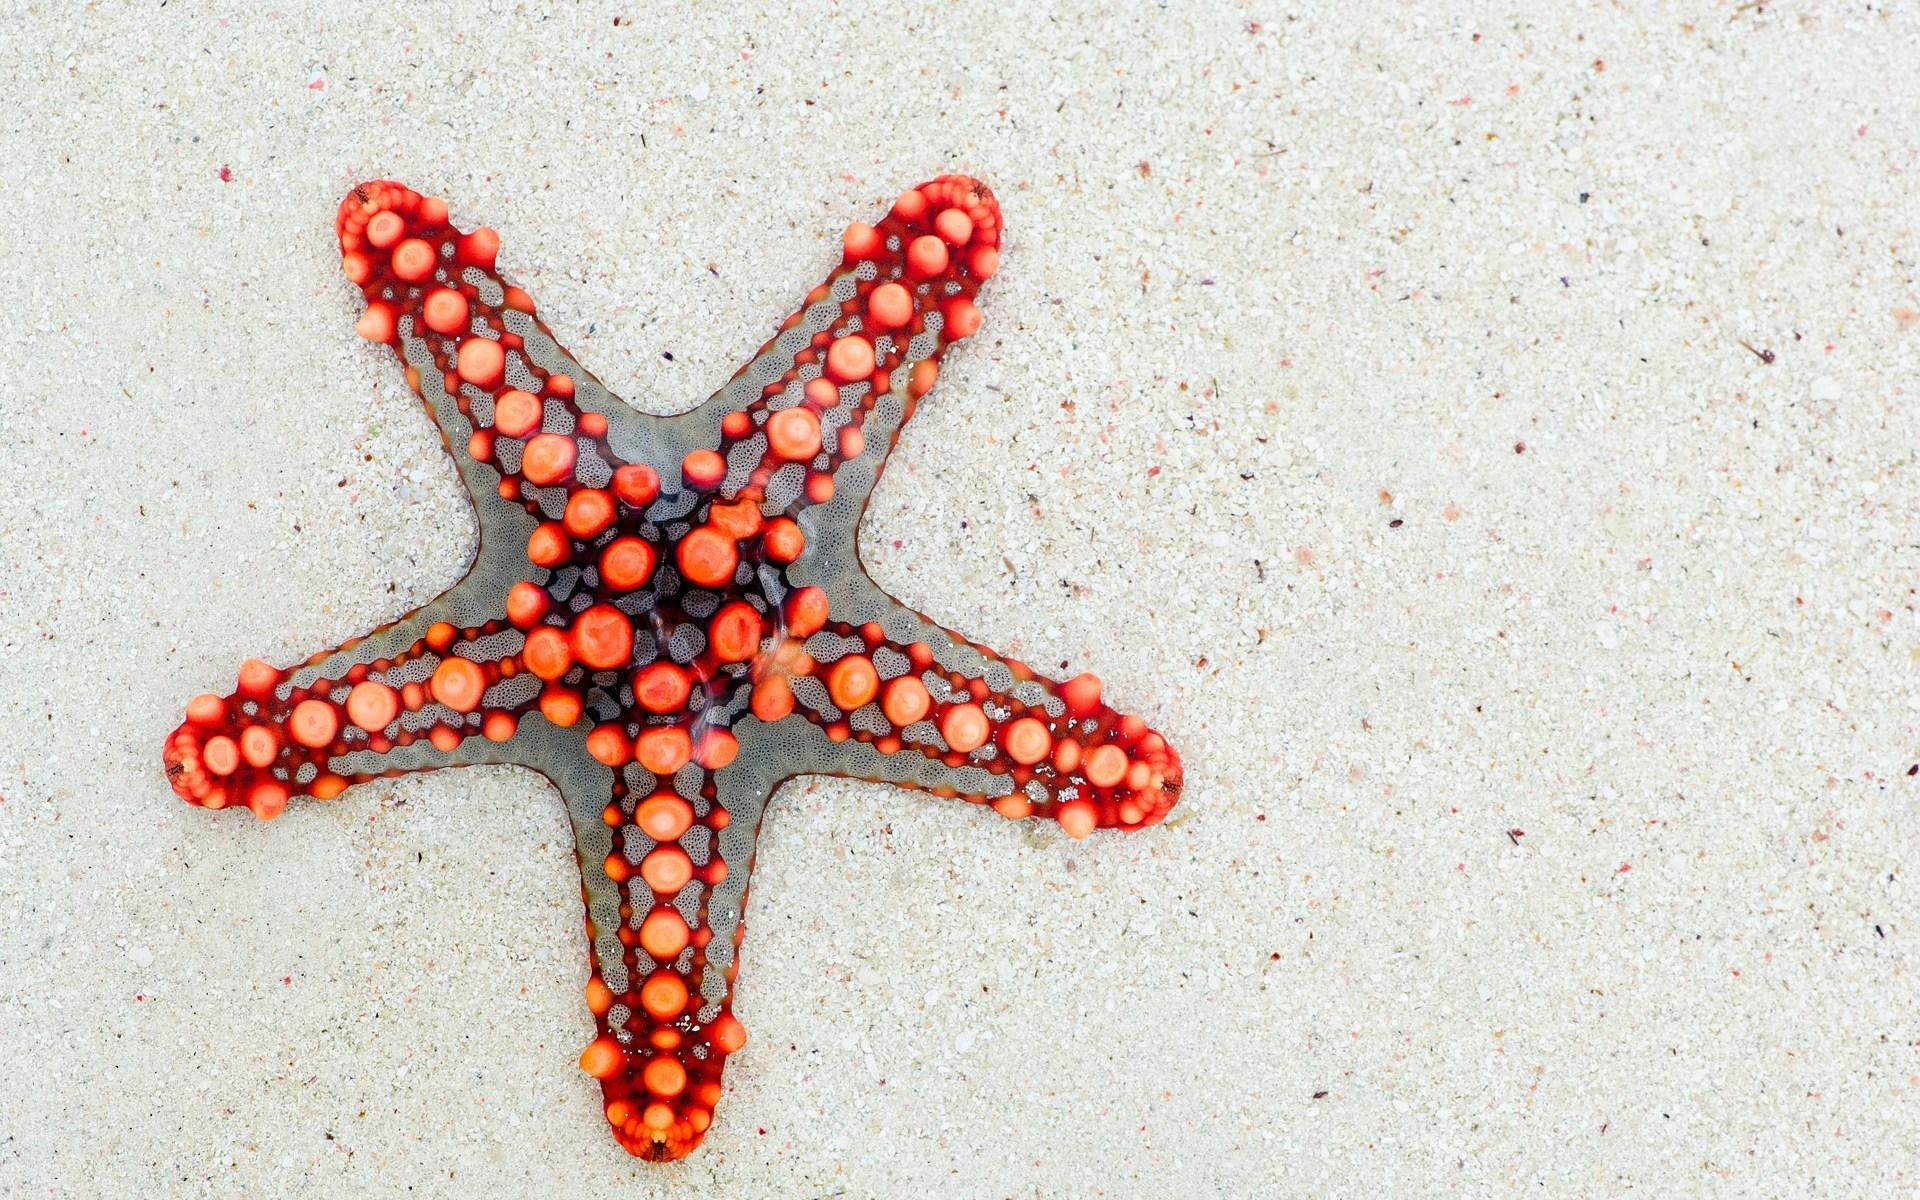 étoile de mer, Zanzibar, sable blanc